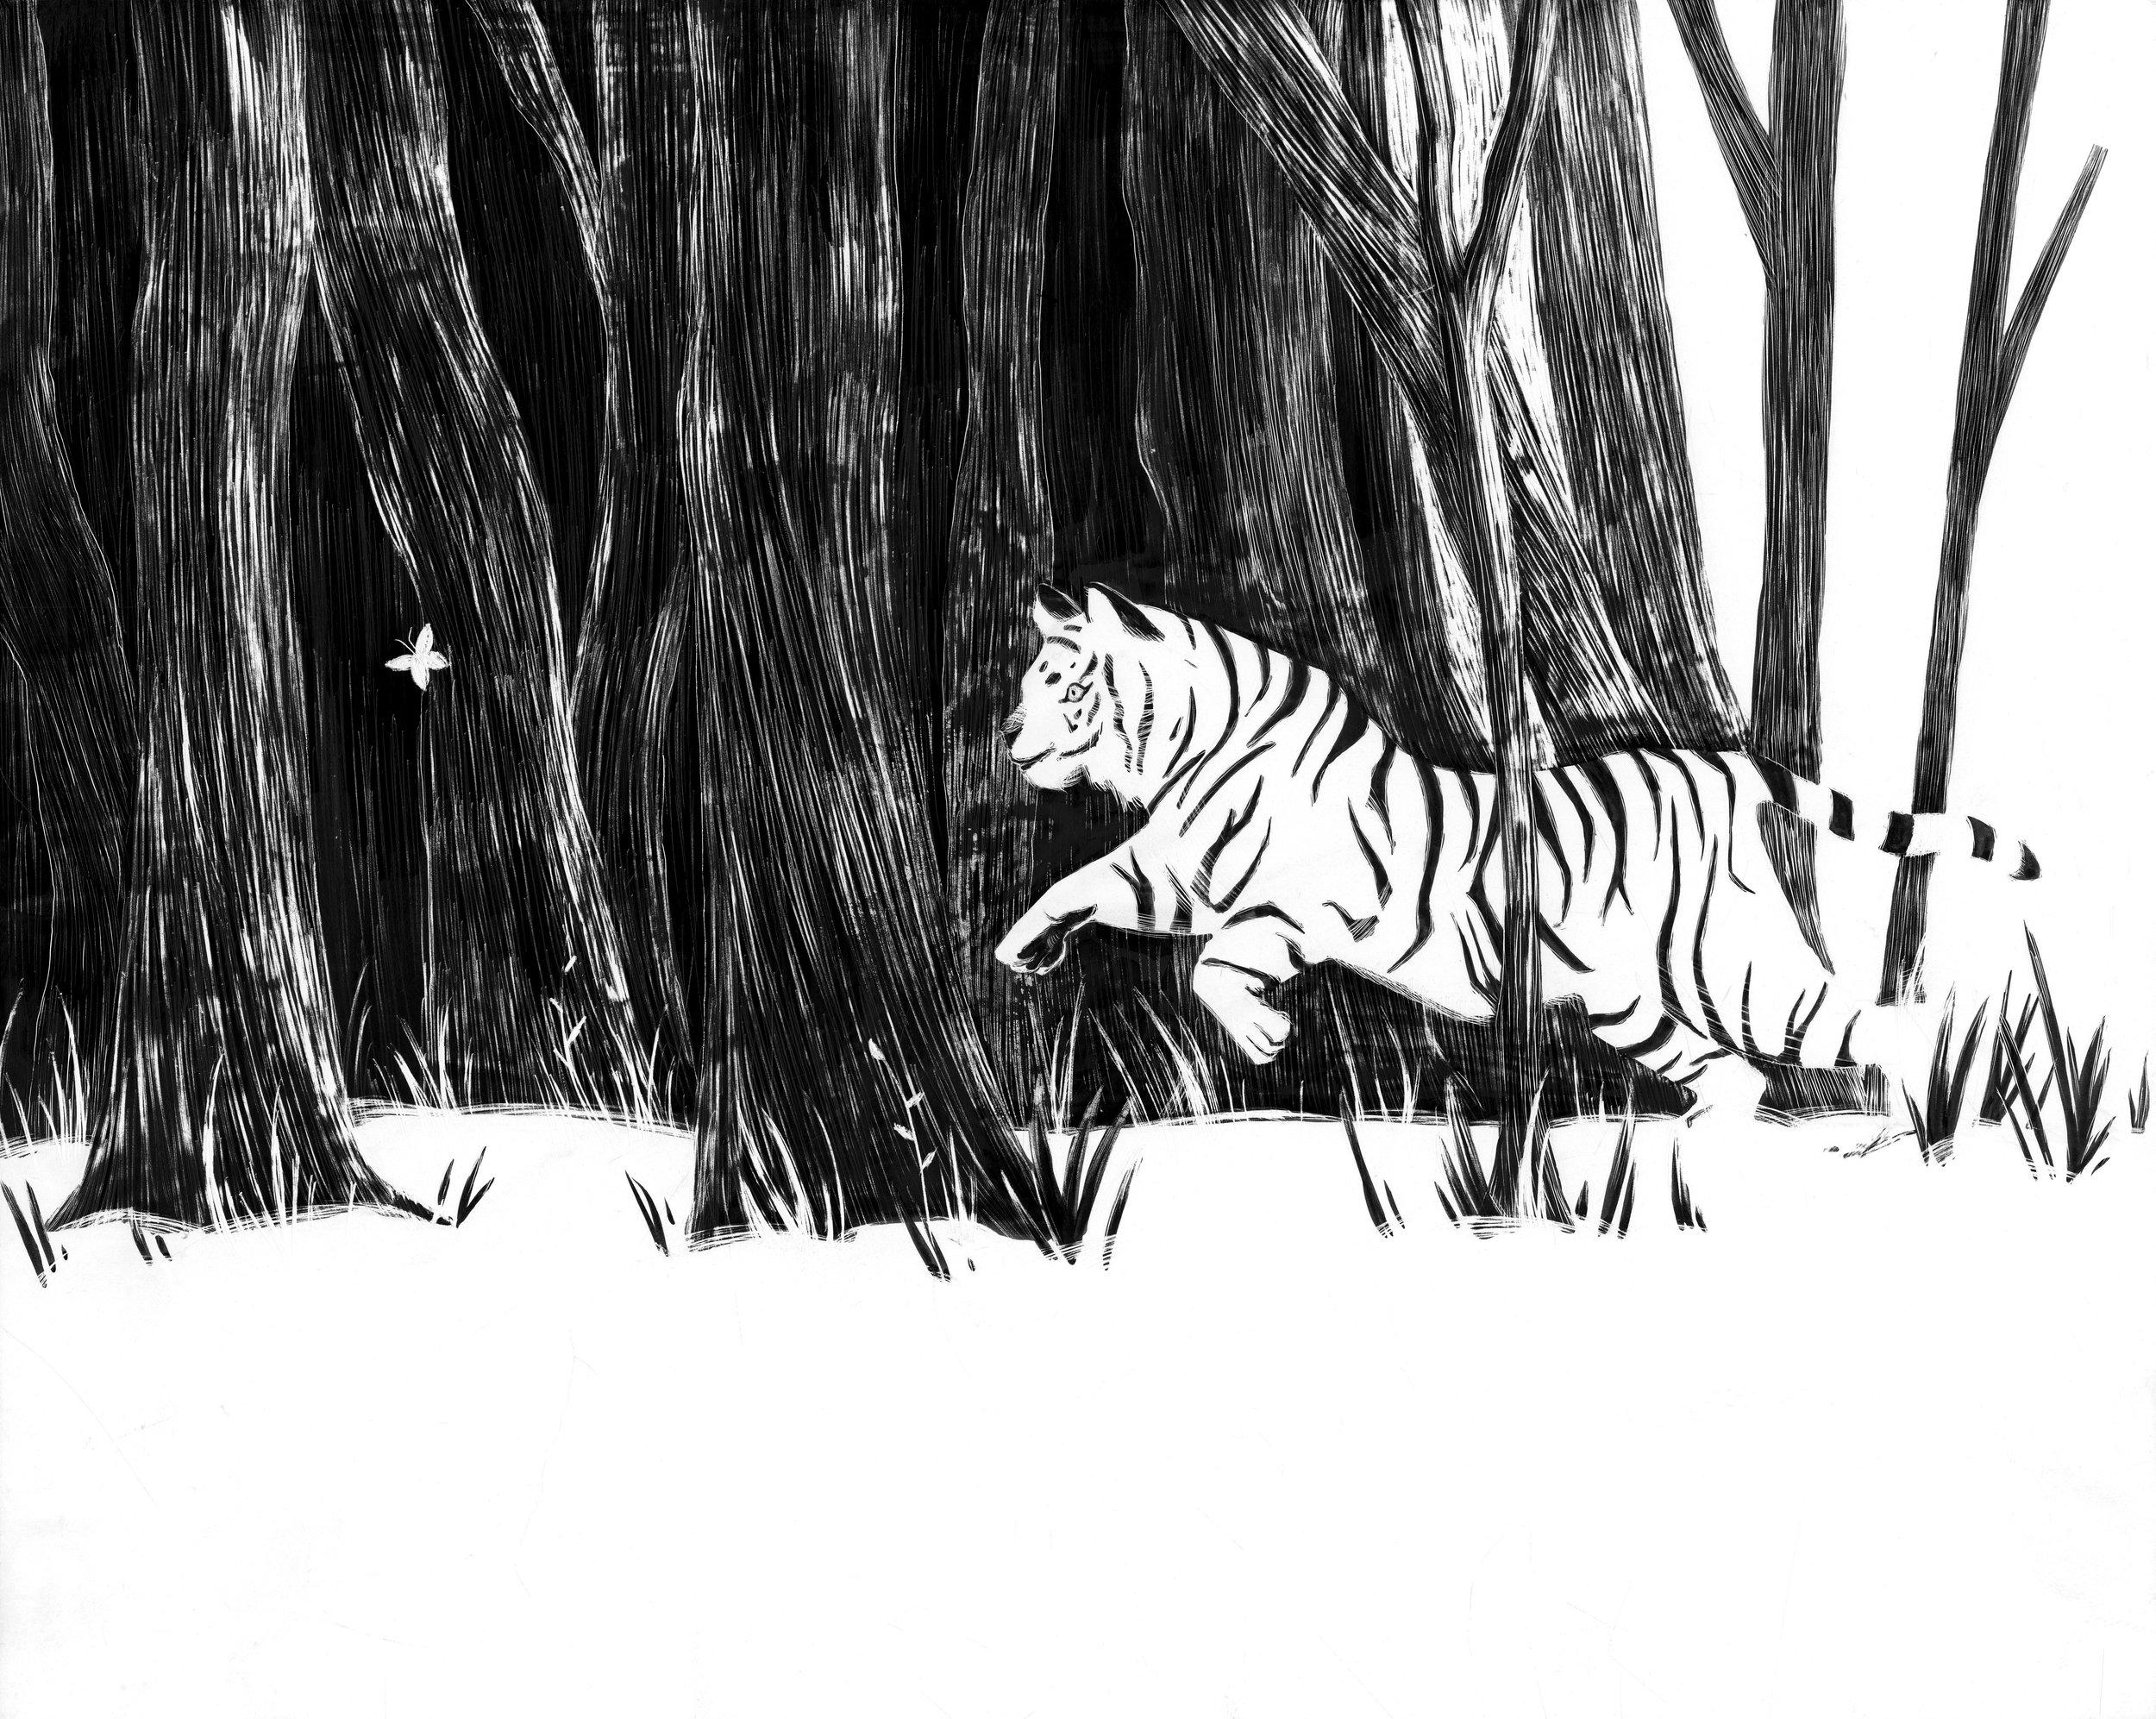 TigerMotion_SarahLee.jpg